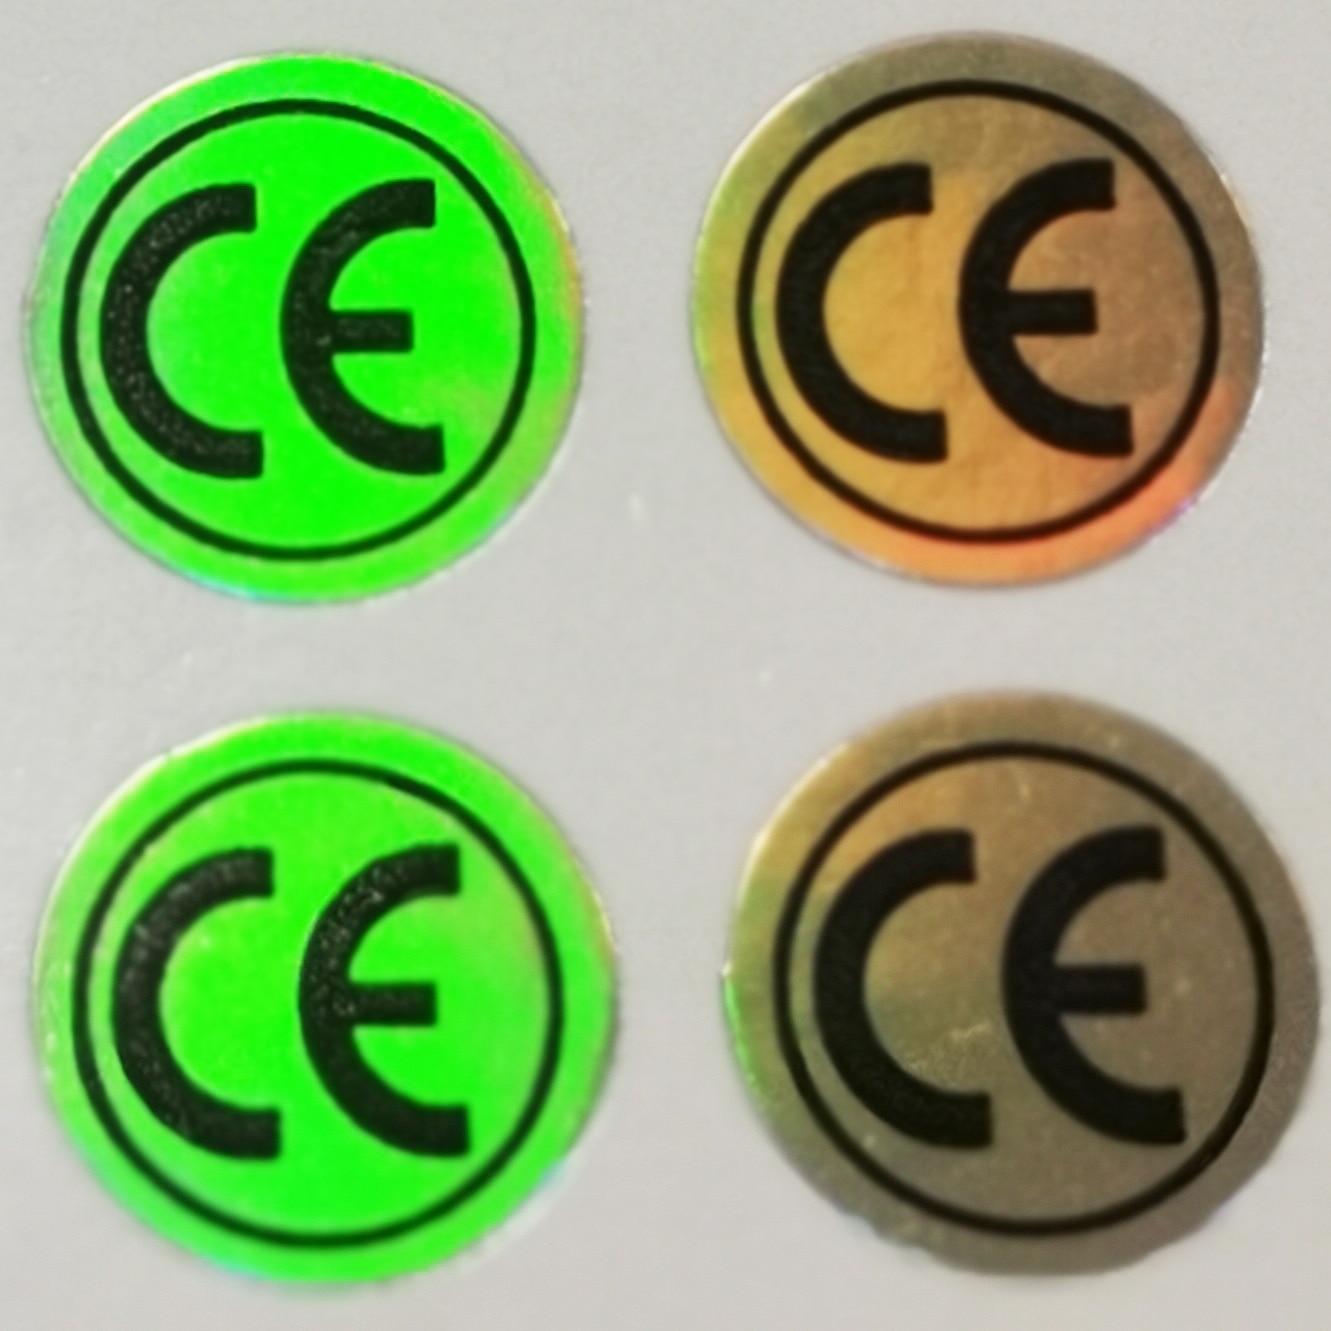 2000 unids/lote 10mm holograma brillante CE signo autoadhesivo holograma etiqueta Artículo No.FA01